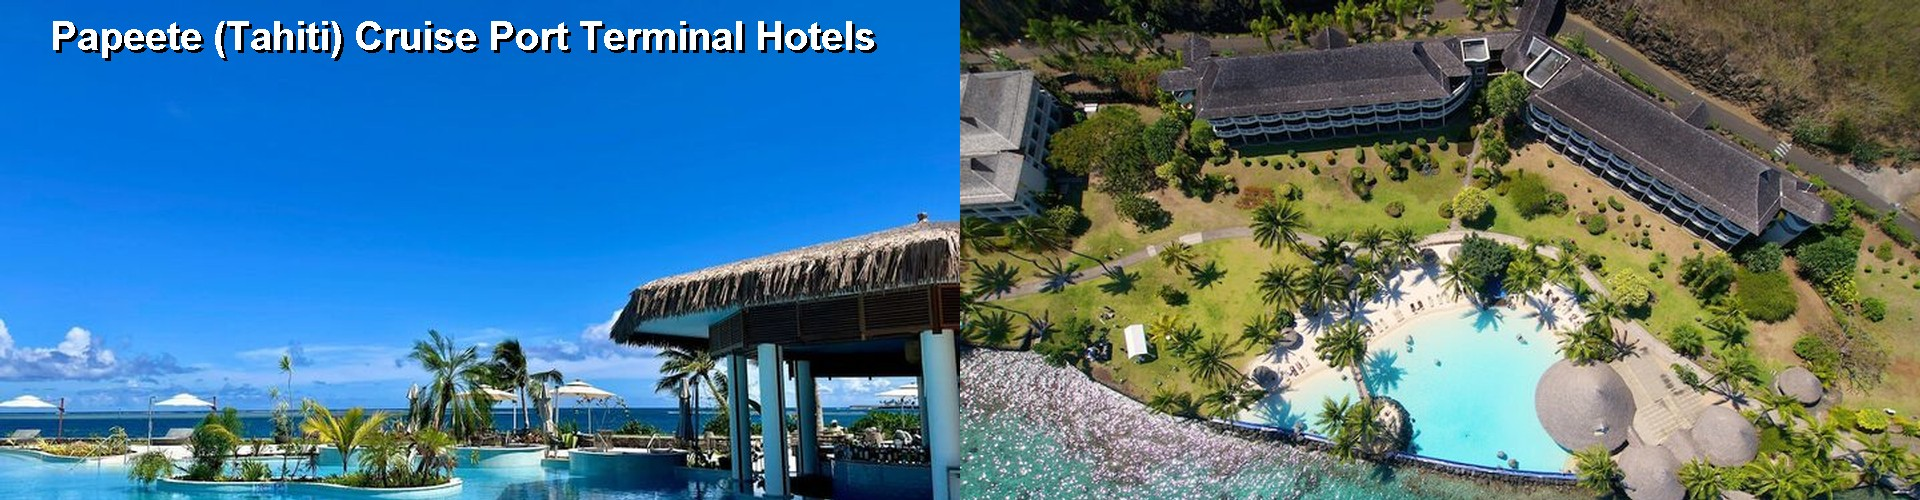 Hotels In Papeete Near Cruise Terminal